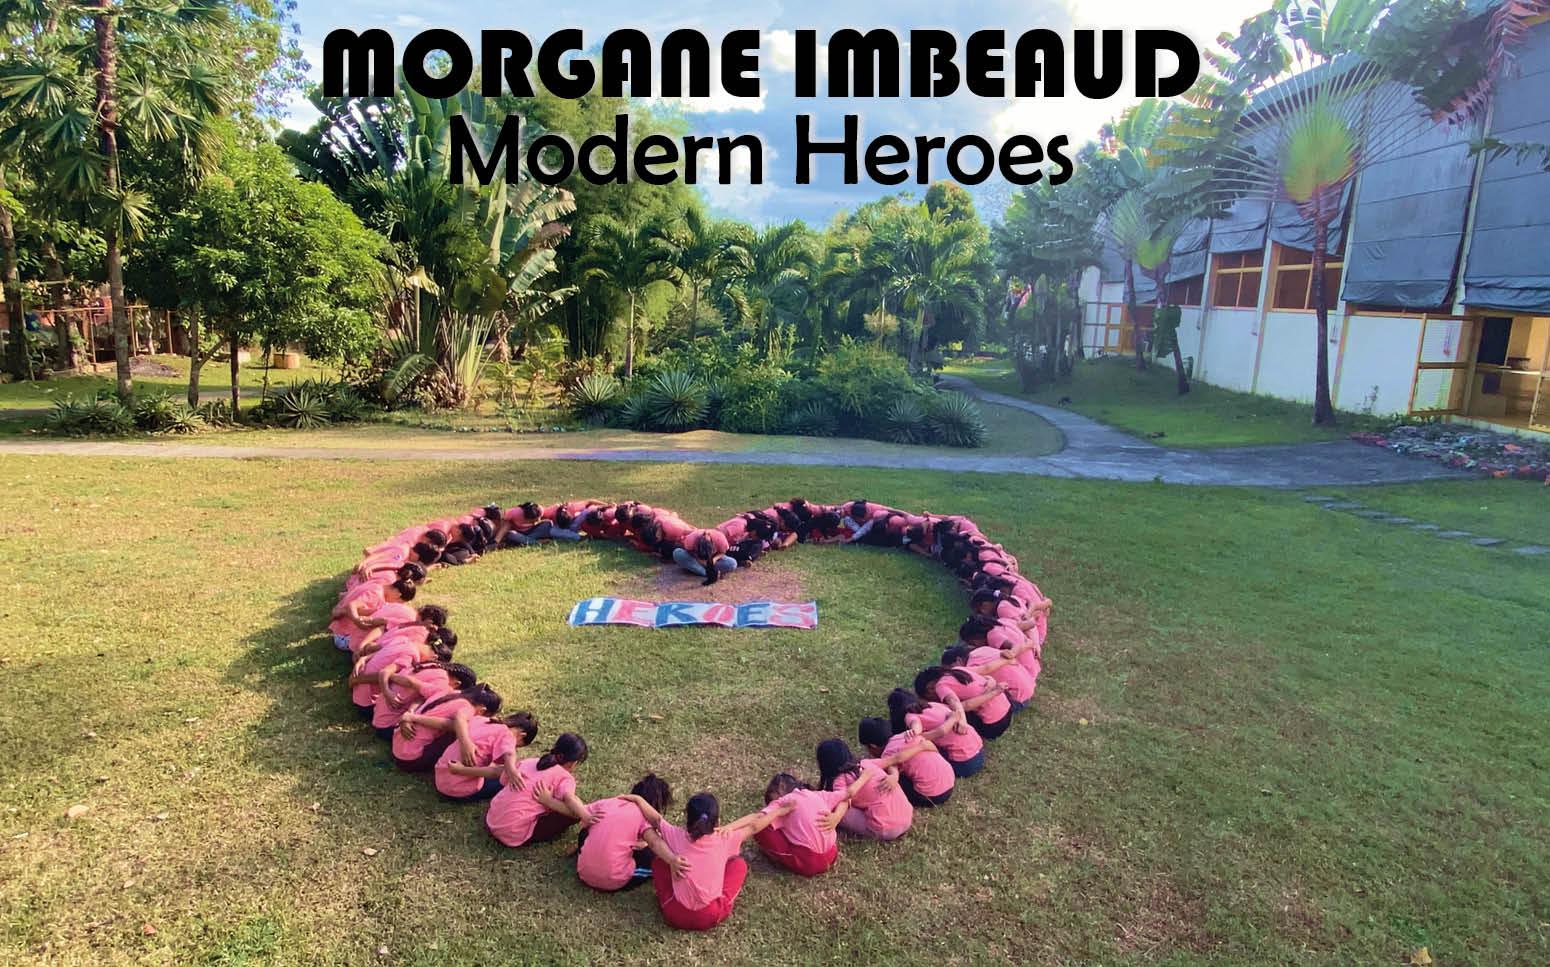 Modern Heroes – Morgane Imbeaud